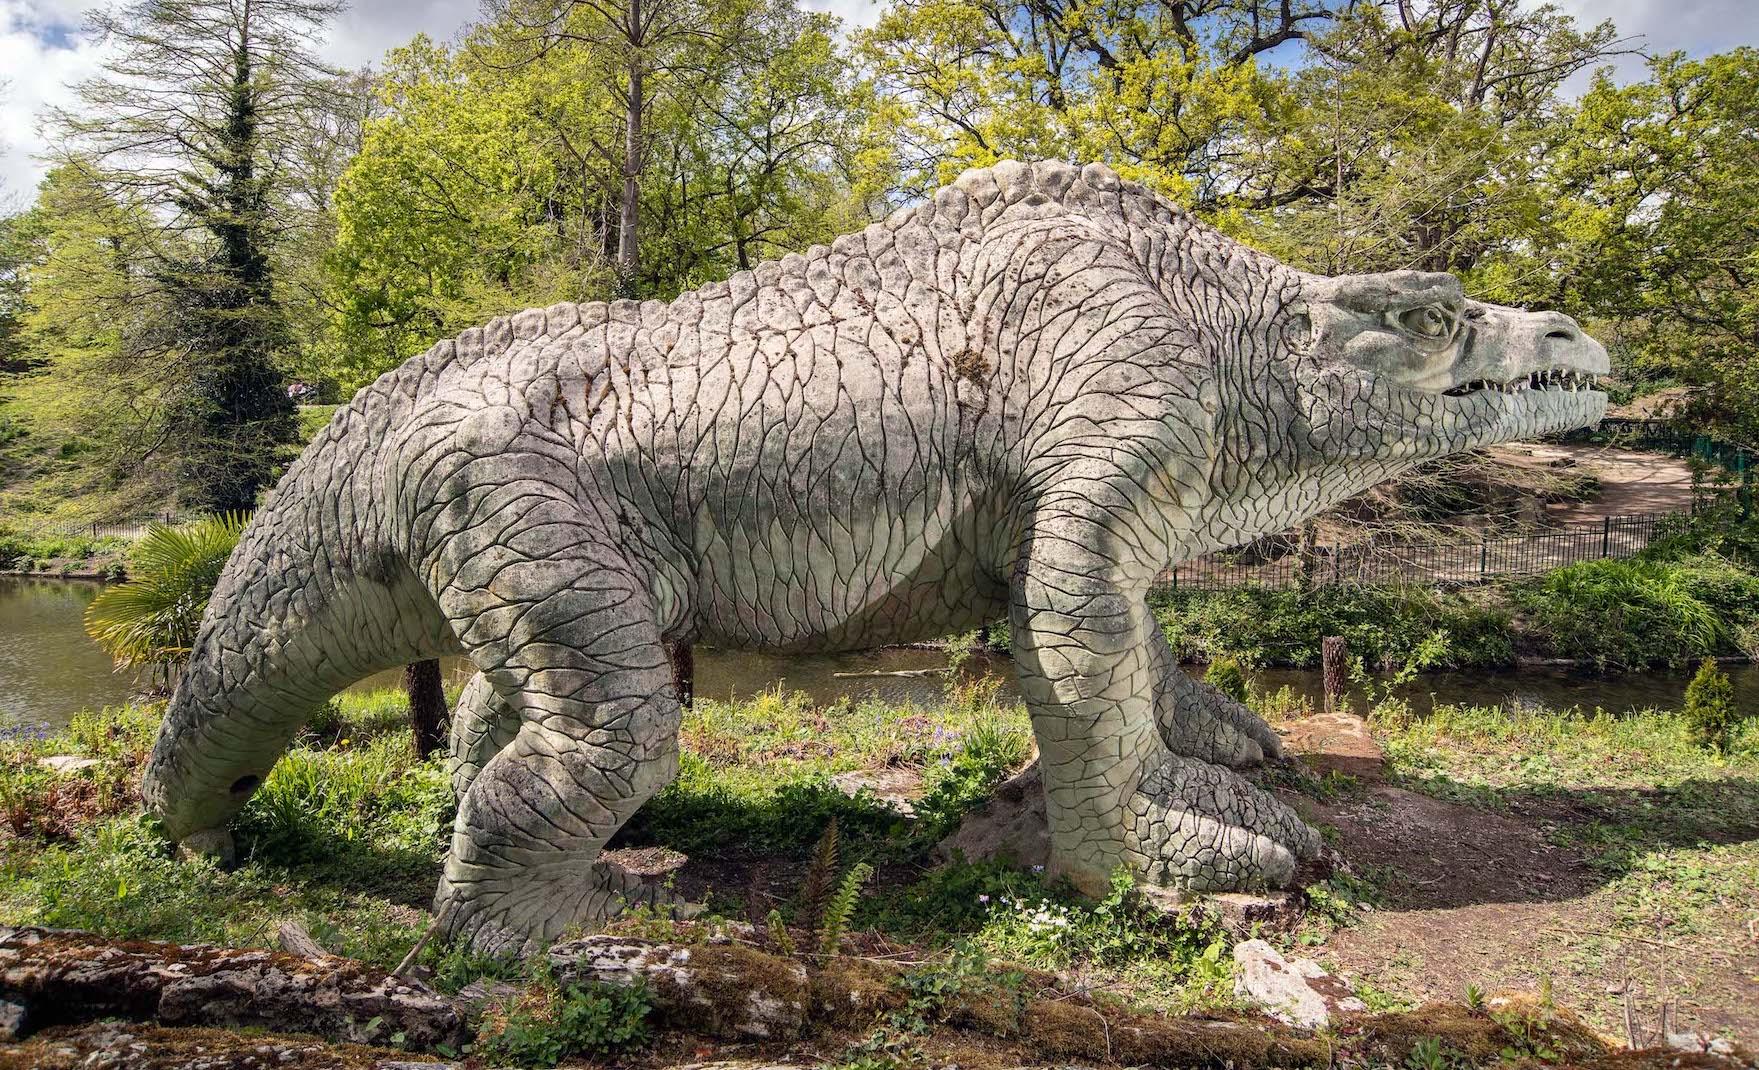 Megalosaur repair